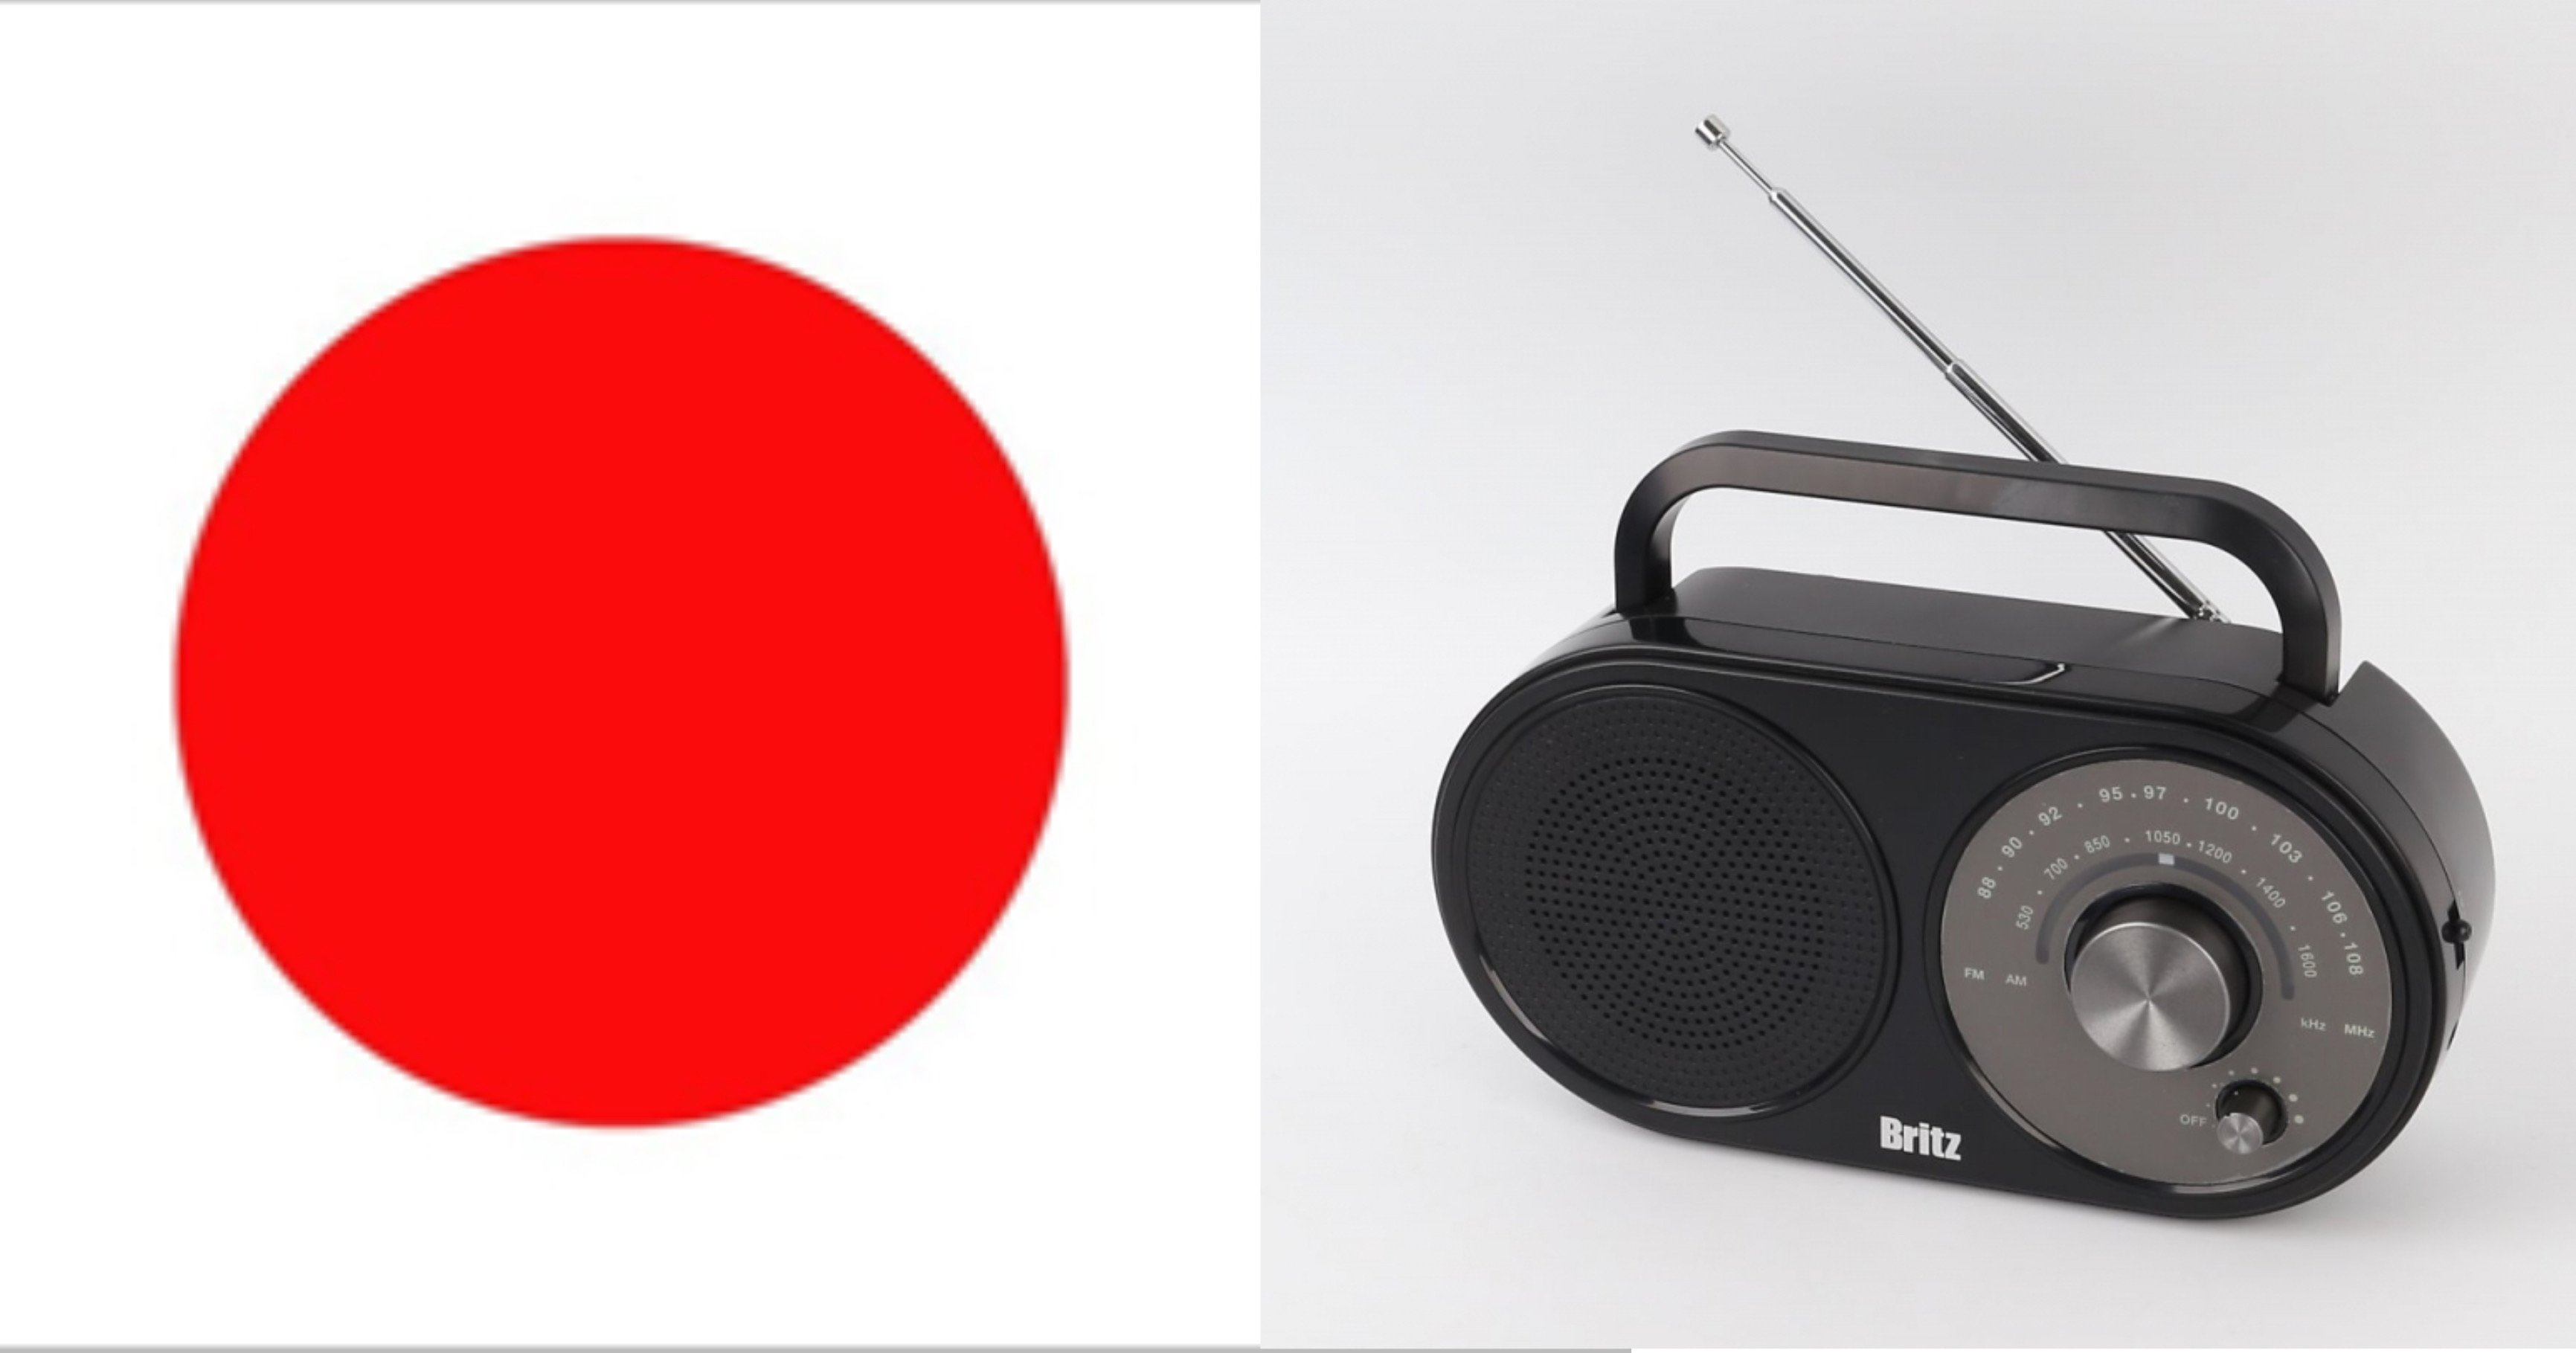 "ec8db8eb84a4ec9dbc2.jpg?resize=412,275 - ""이것 때문 이였다니...""... 일본음악이 공중파에 나올 수 없는 이유"